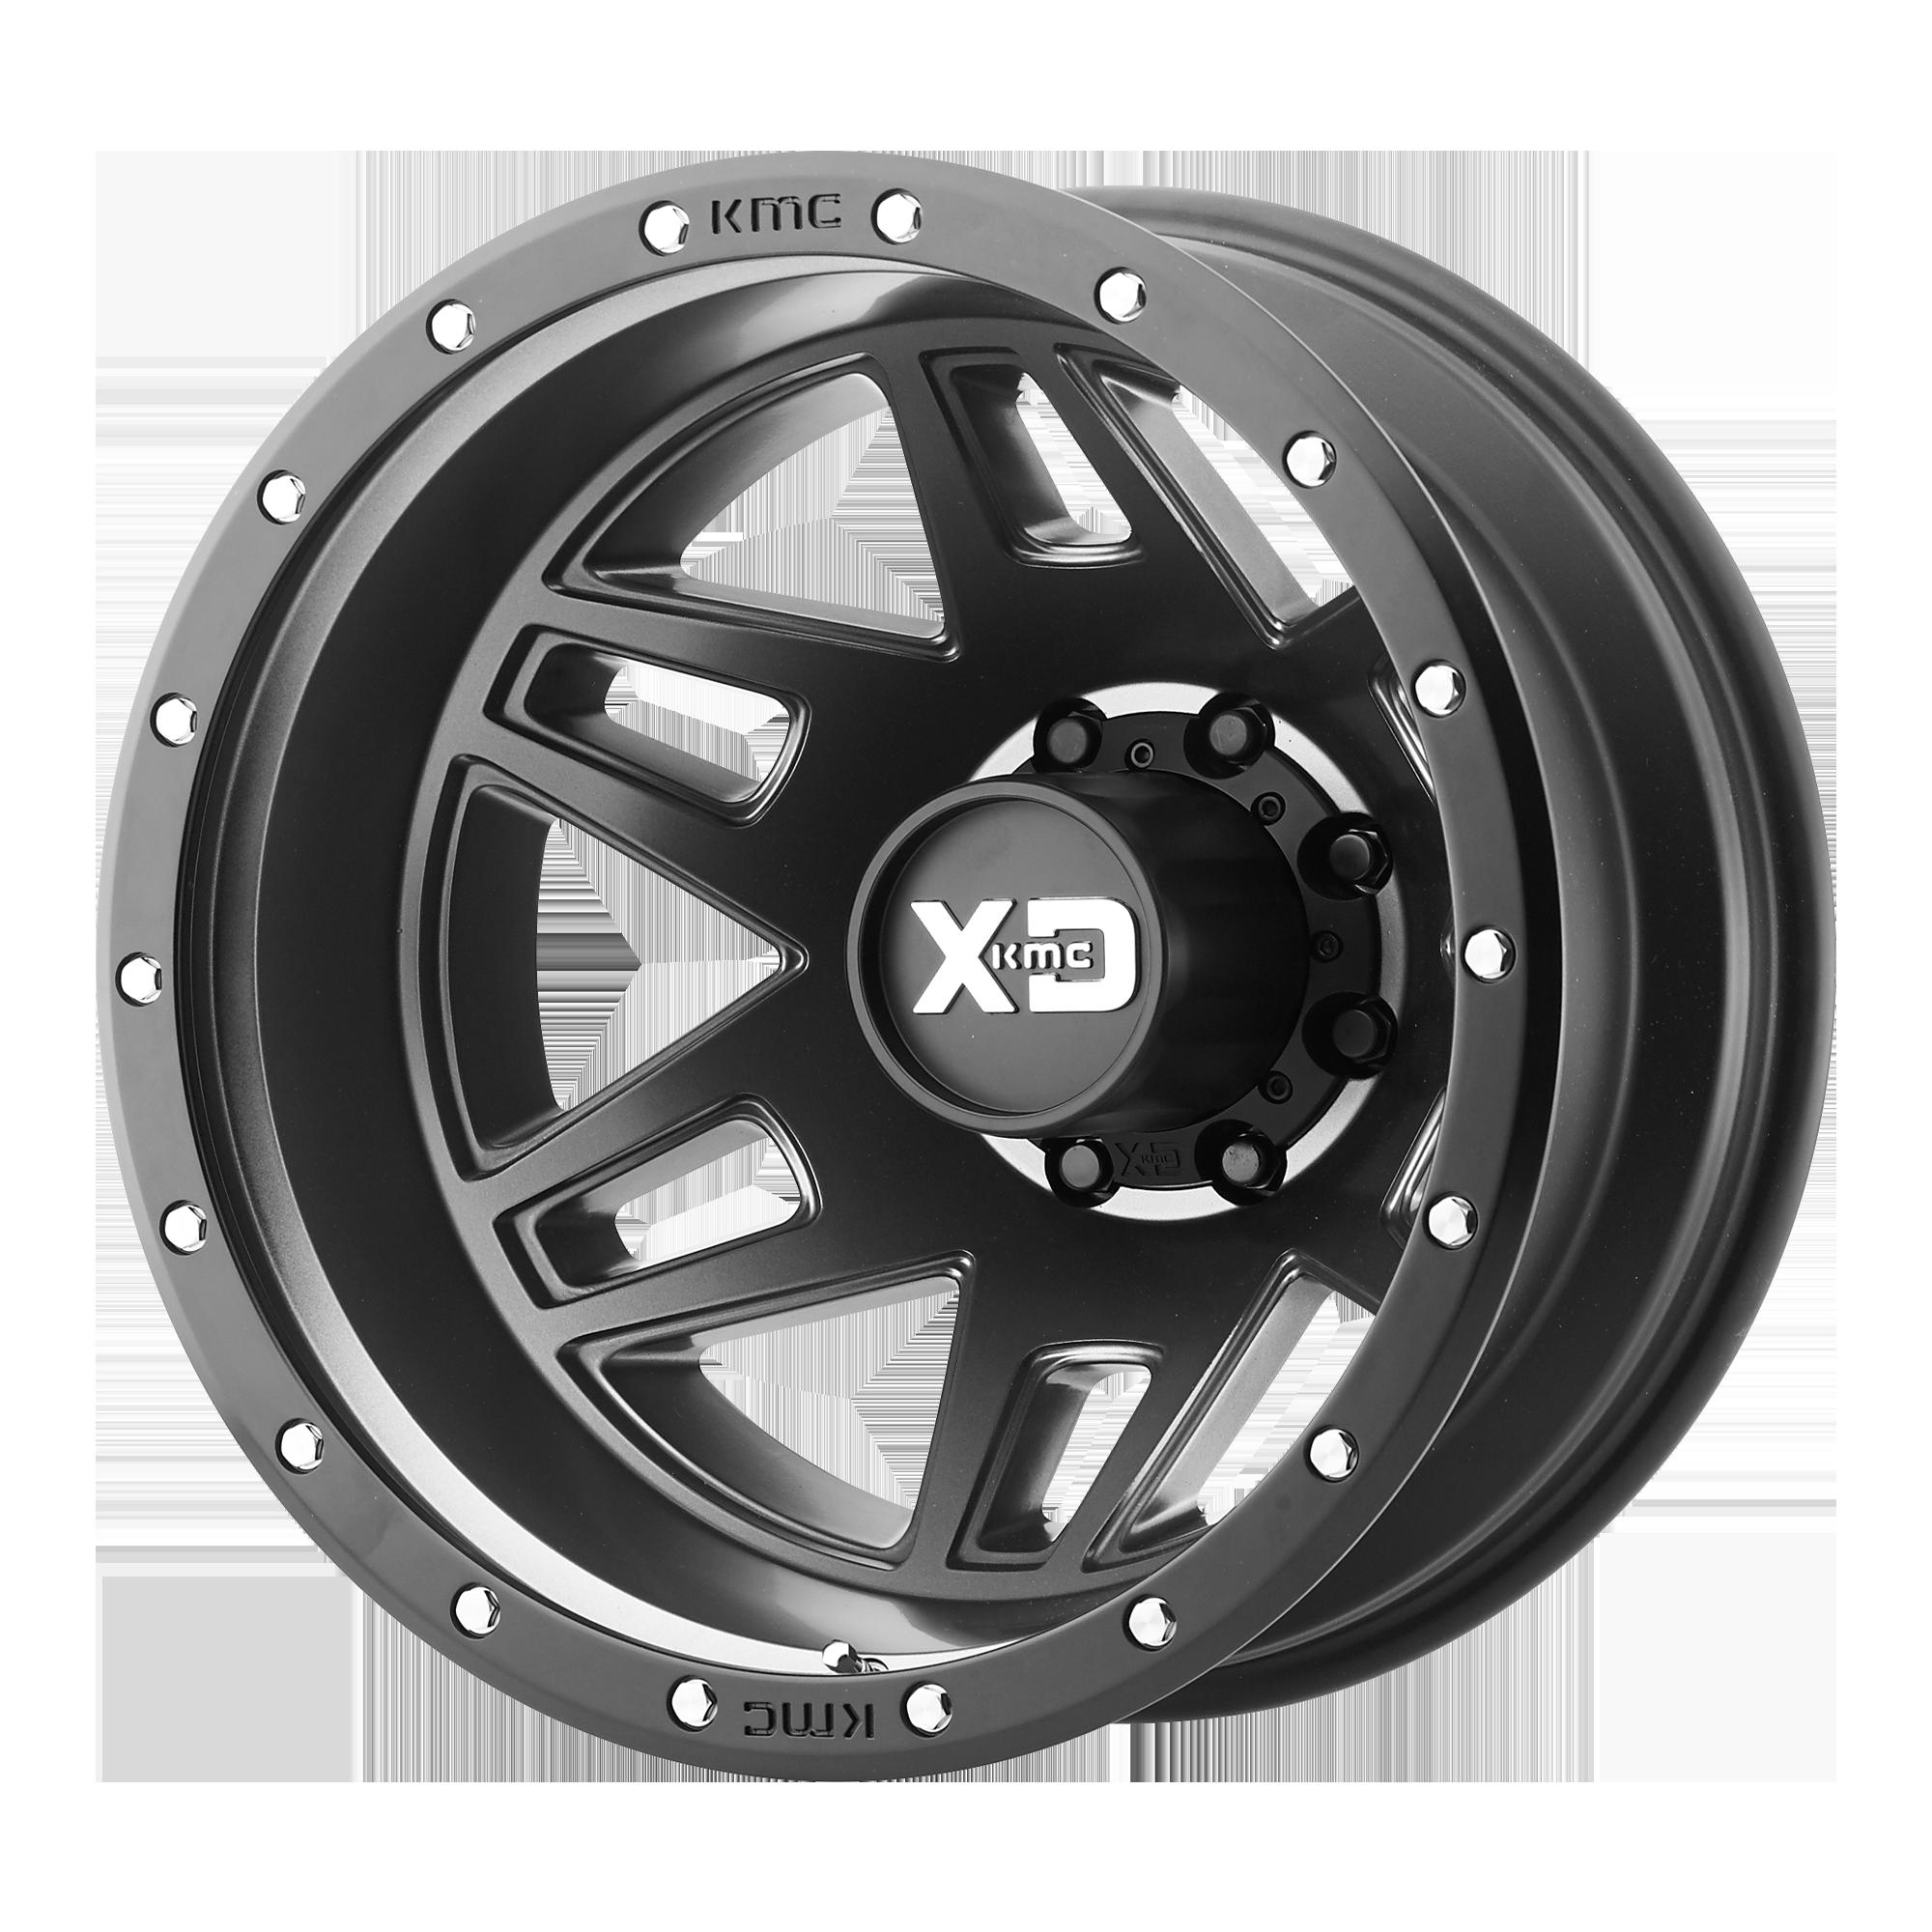 XD SERIES XD130 MACHETE DUALLY hliníkové disky 7,5x20 8x170 ET-152 Satin Black With Reinforcing Ring